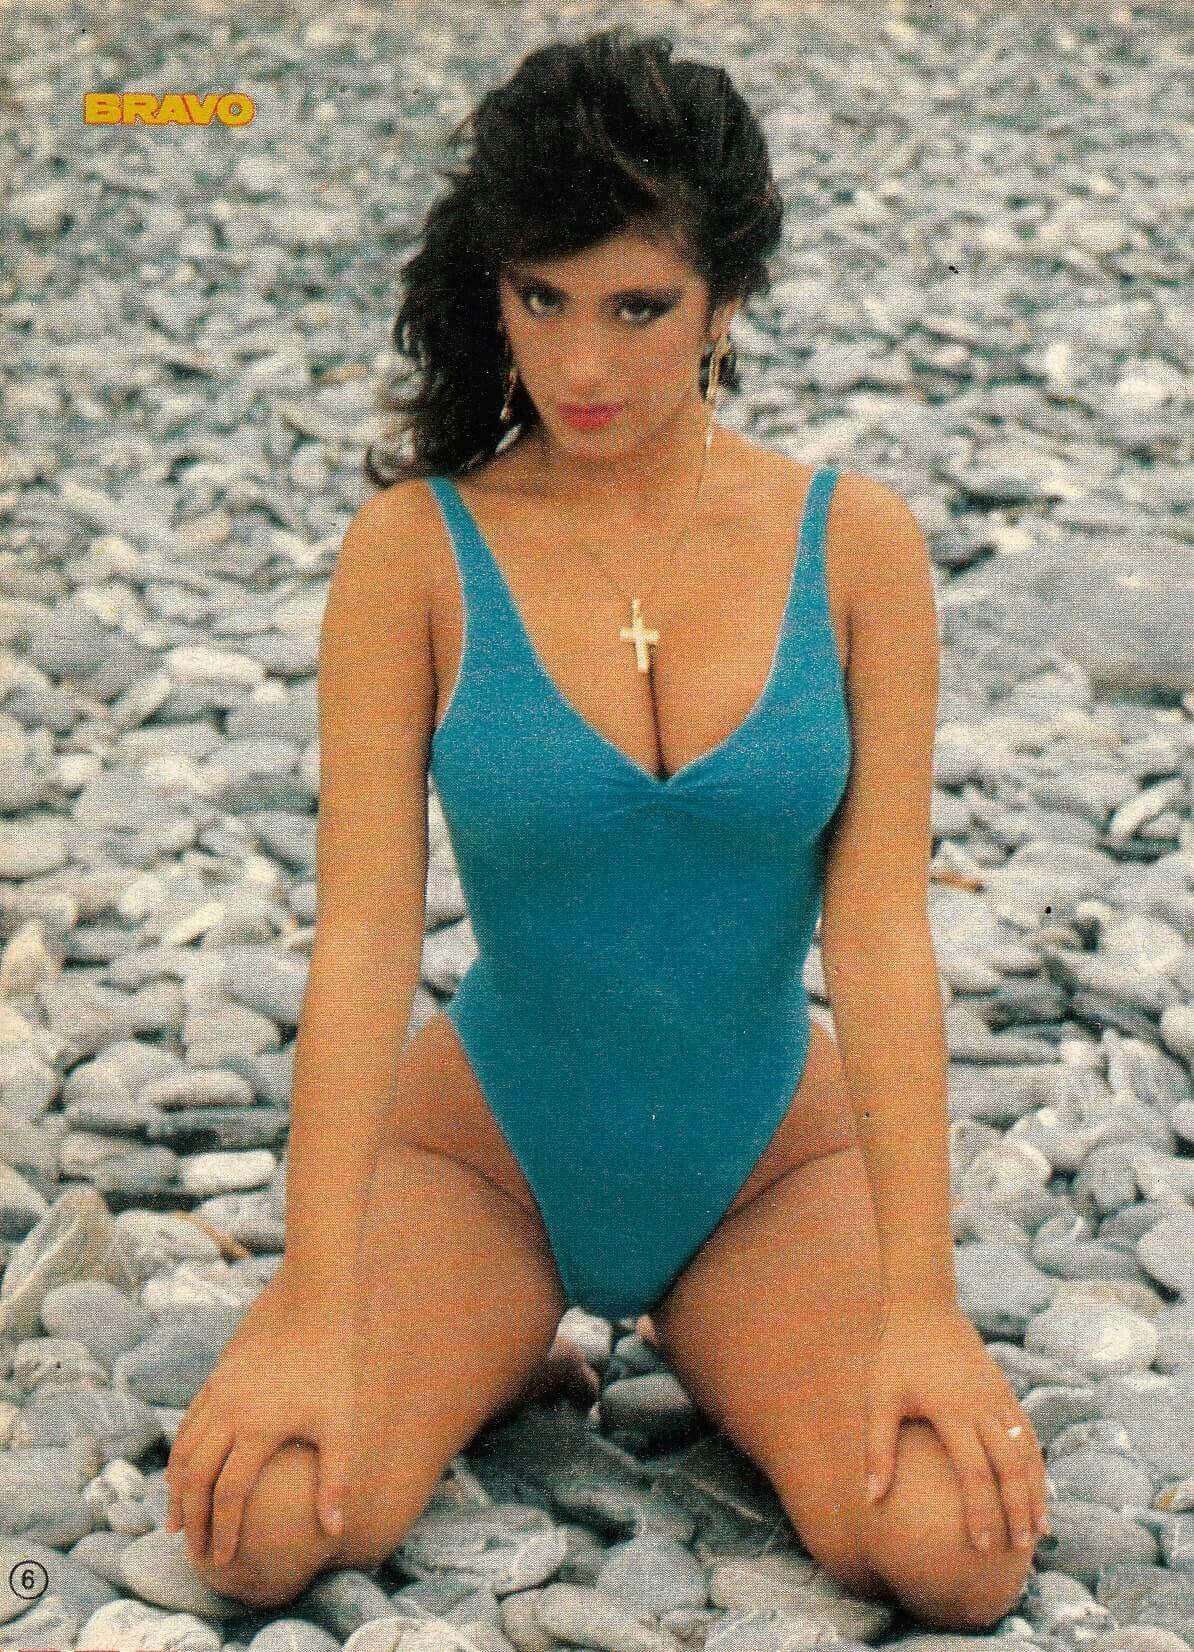 Sabrina Salerno Sabrina Sabrina Salerno Et Swimwear